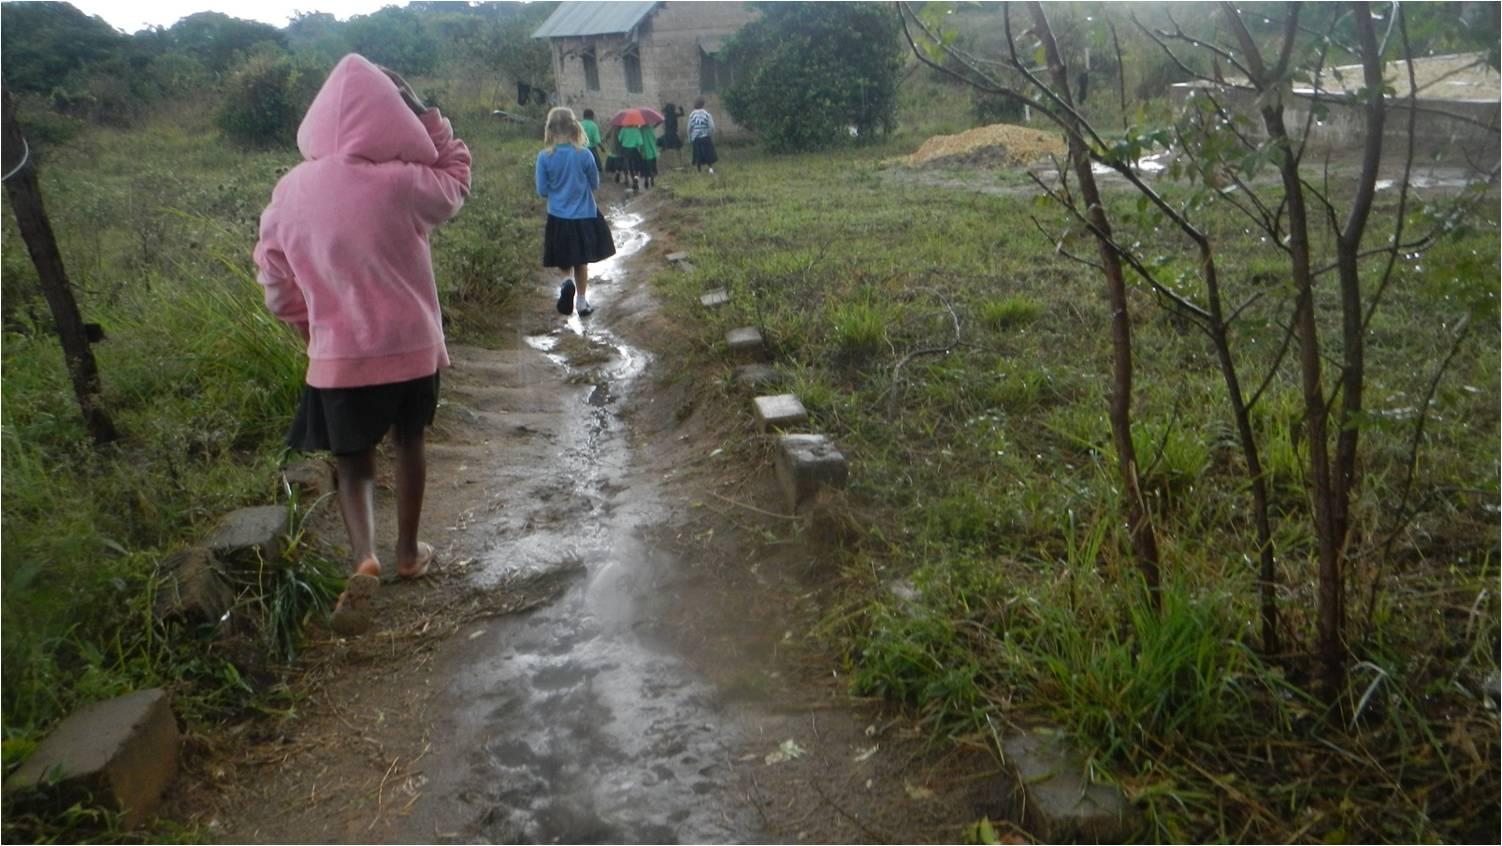 clara_water_rain_path.jpg